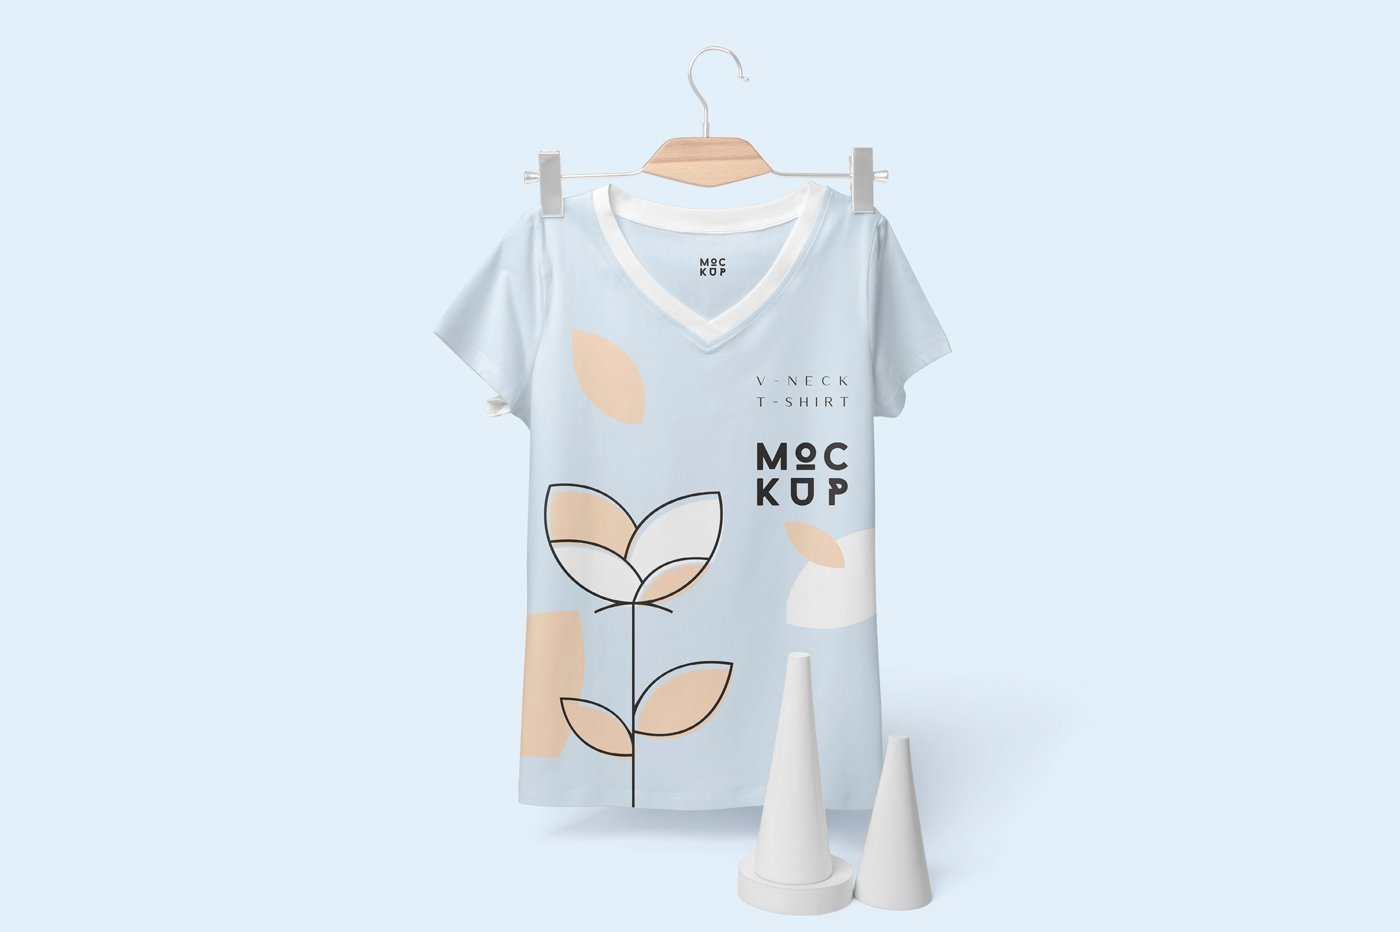 Round Neck T Shirt Mockup Psd Free